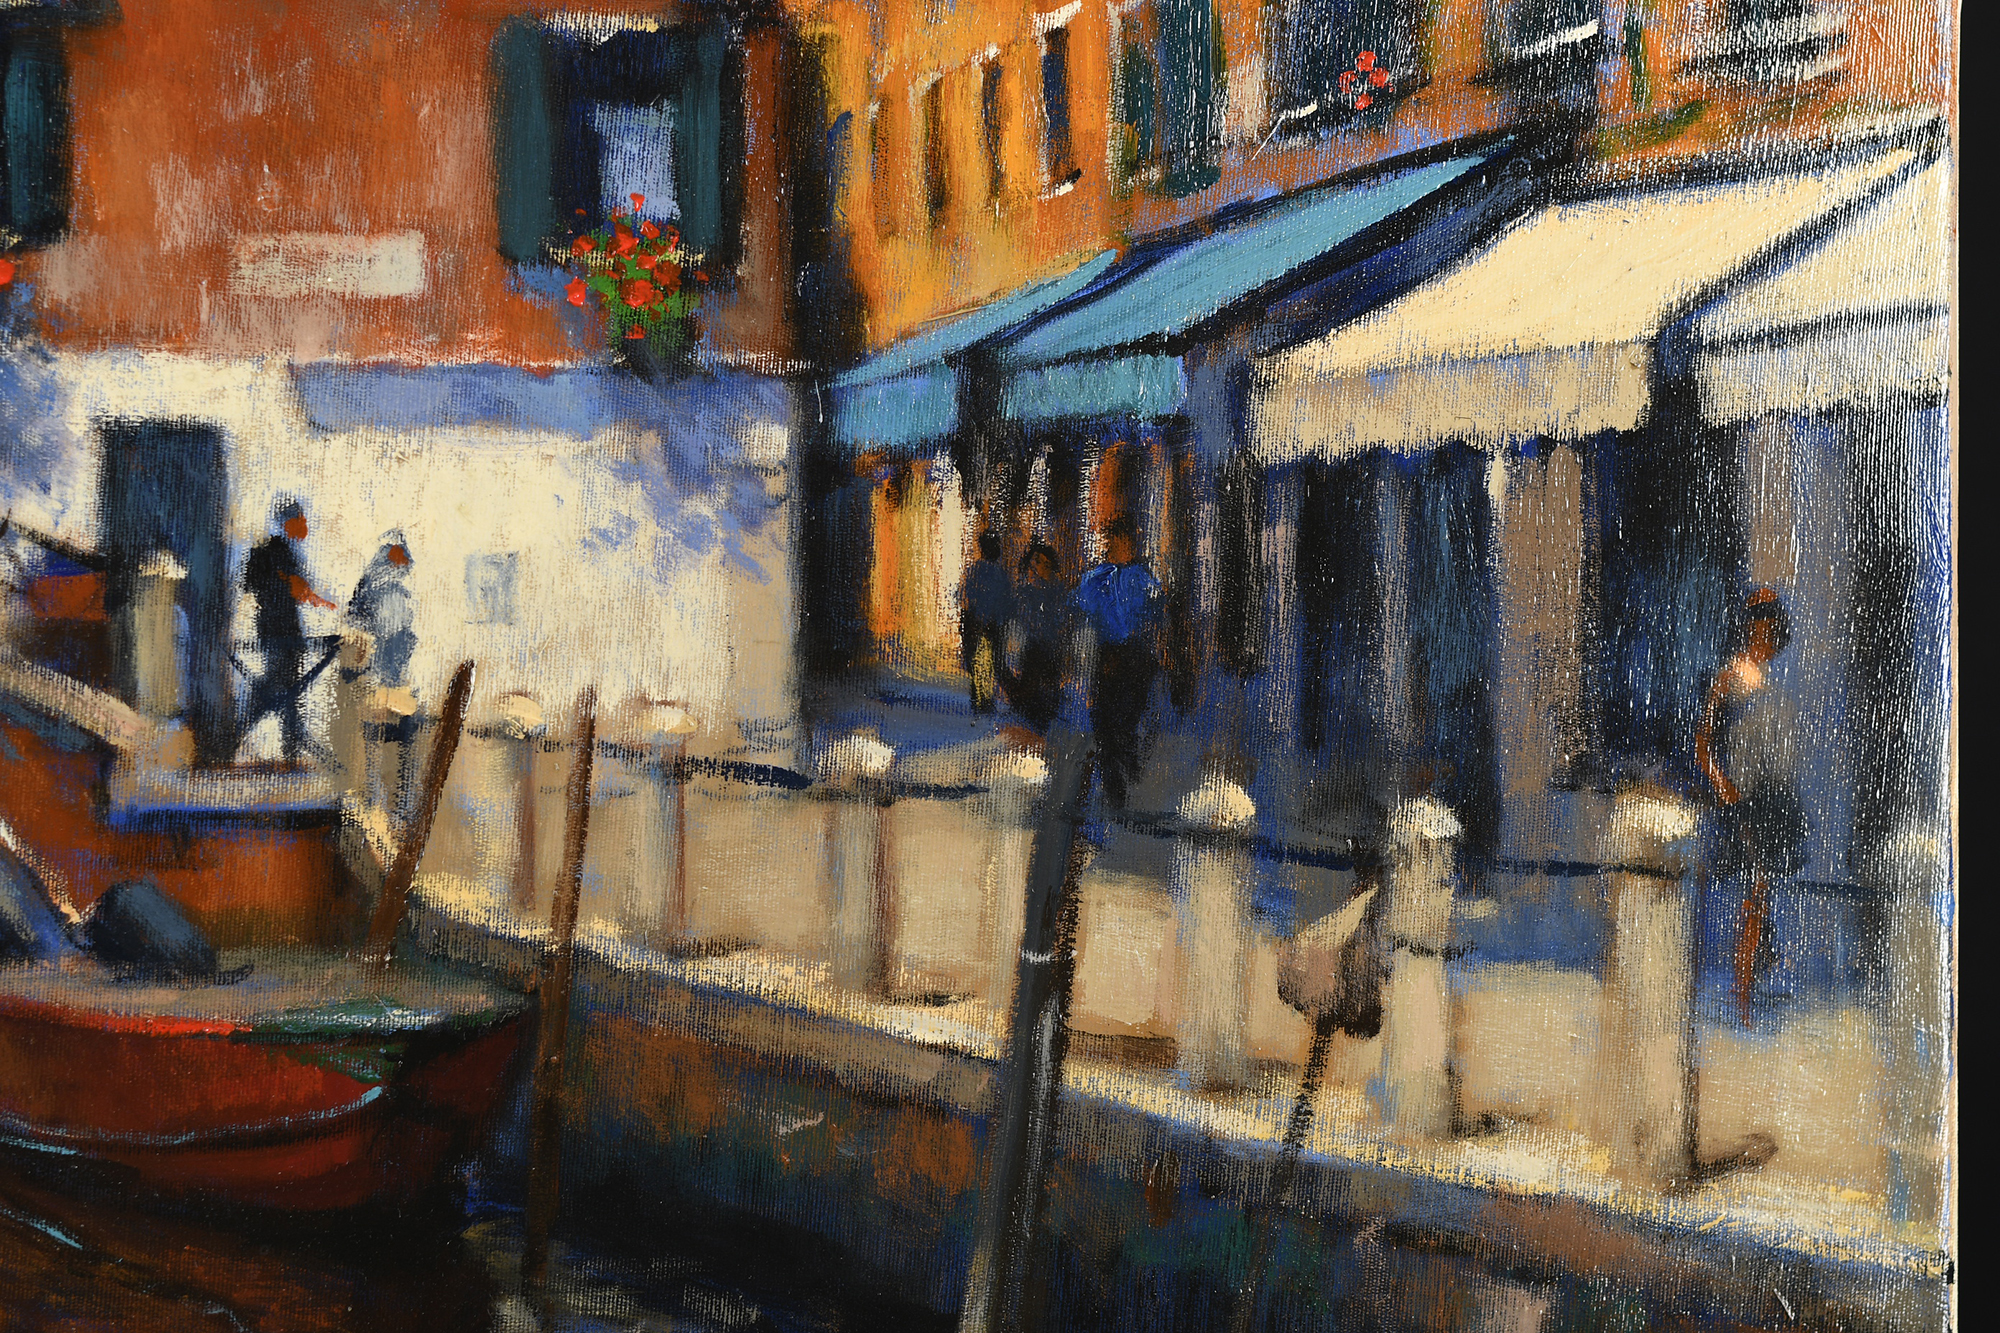 John Mackie original Painting - Image 5 of 6